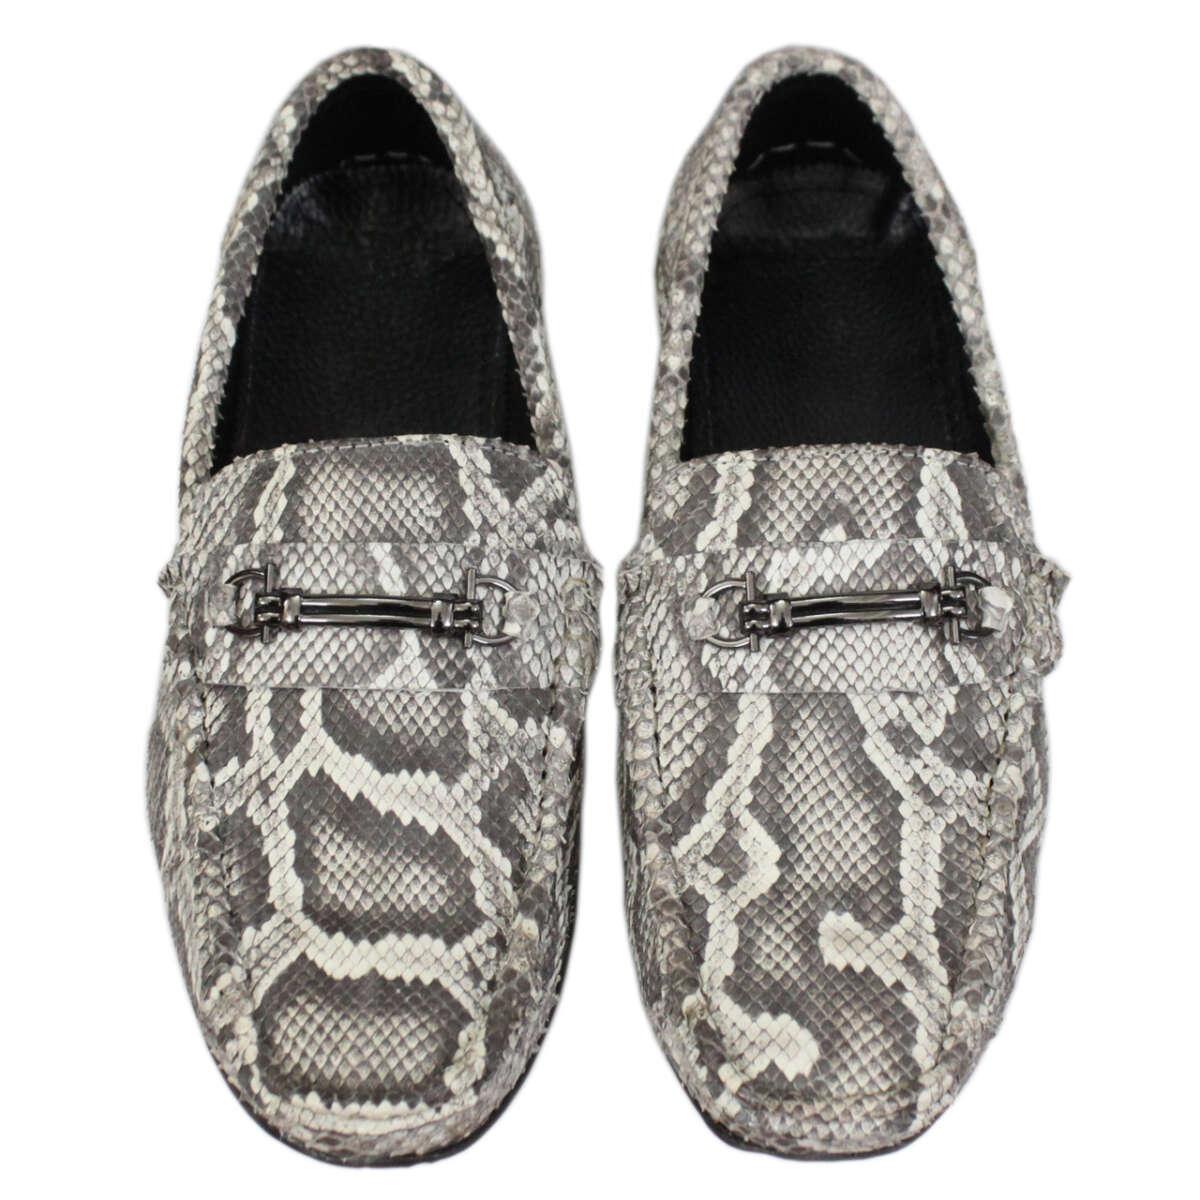 Giày lười nam da trăn T858a